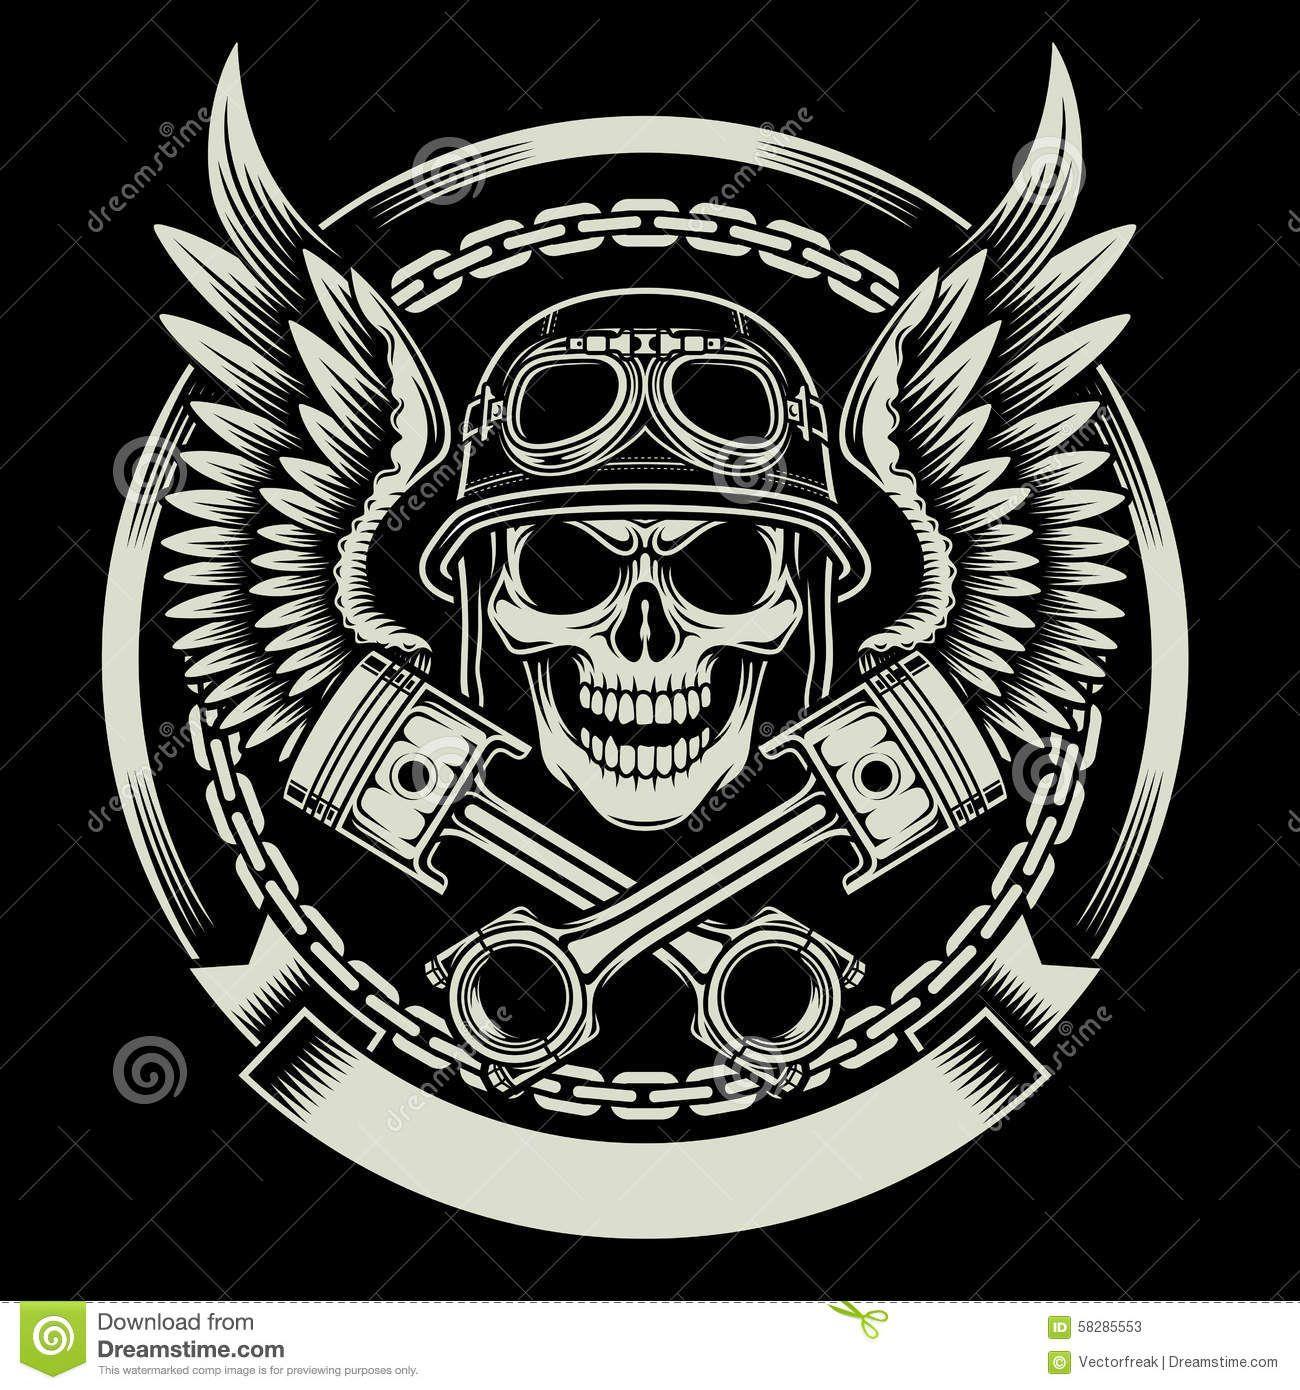 bikers skull logo - photo #2